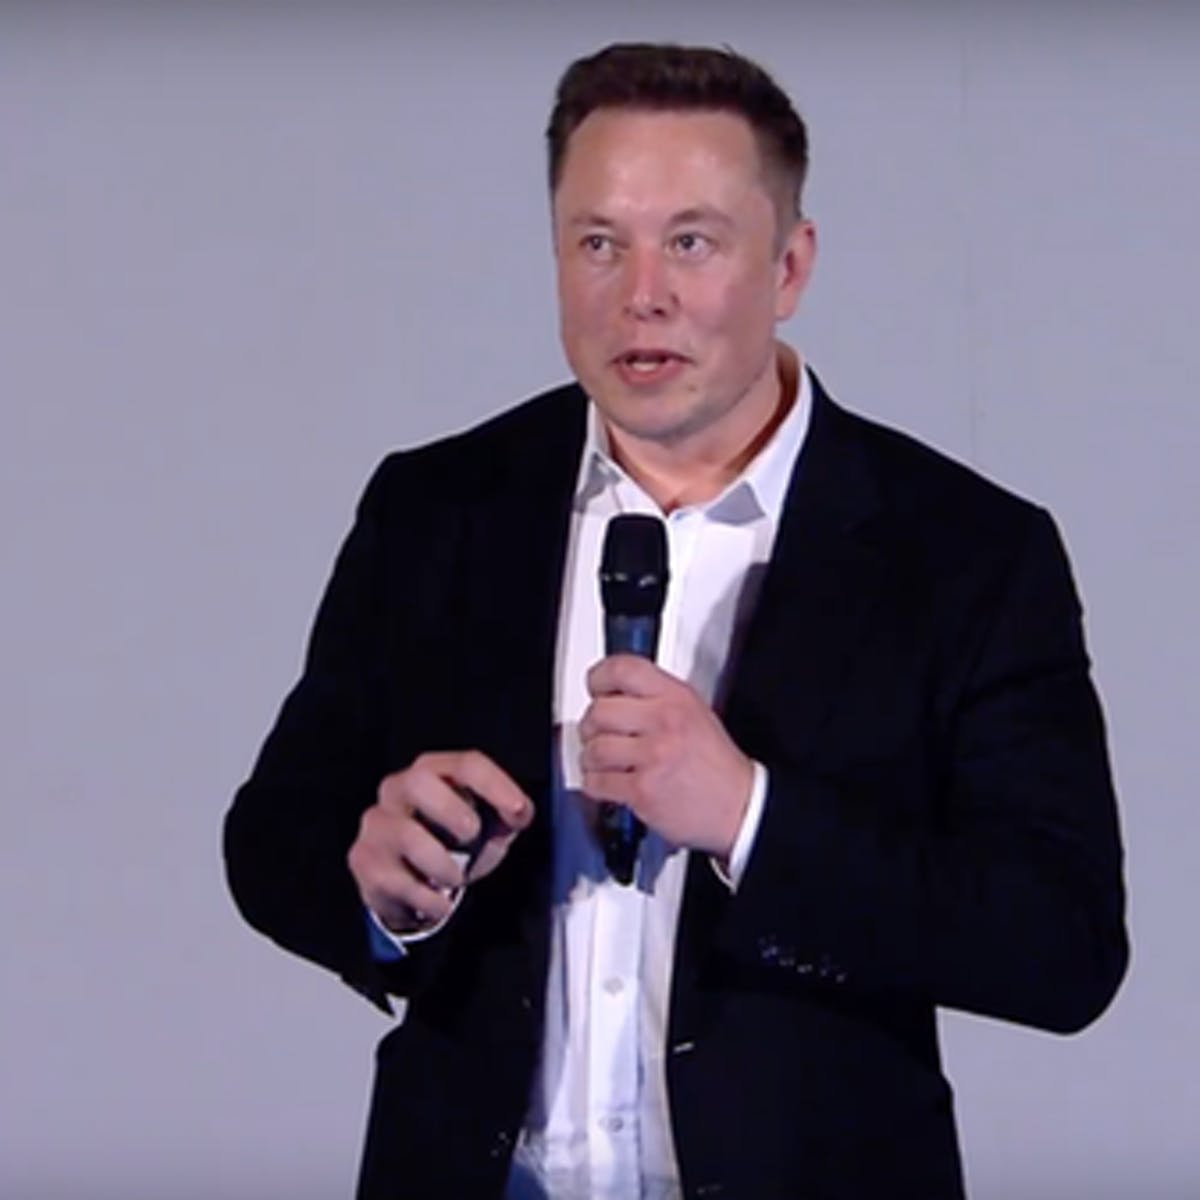 Musk Reads: Tesla Biohacker Beats Neuralink